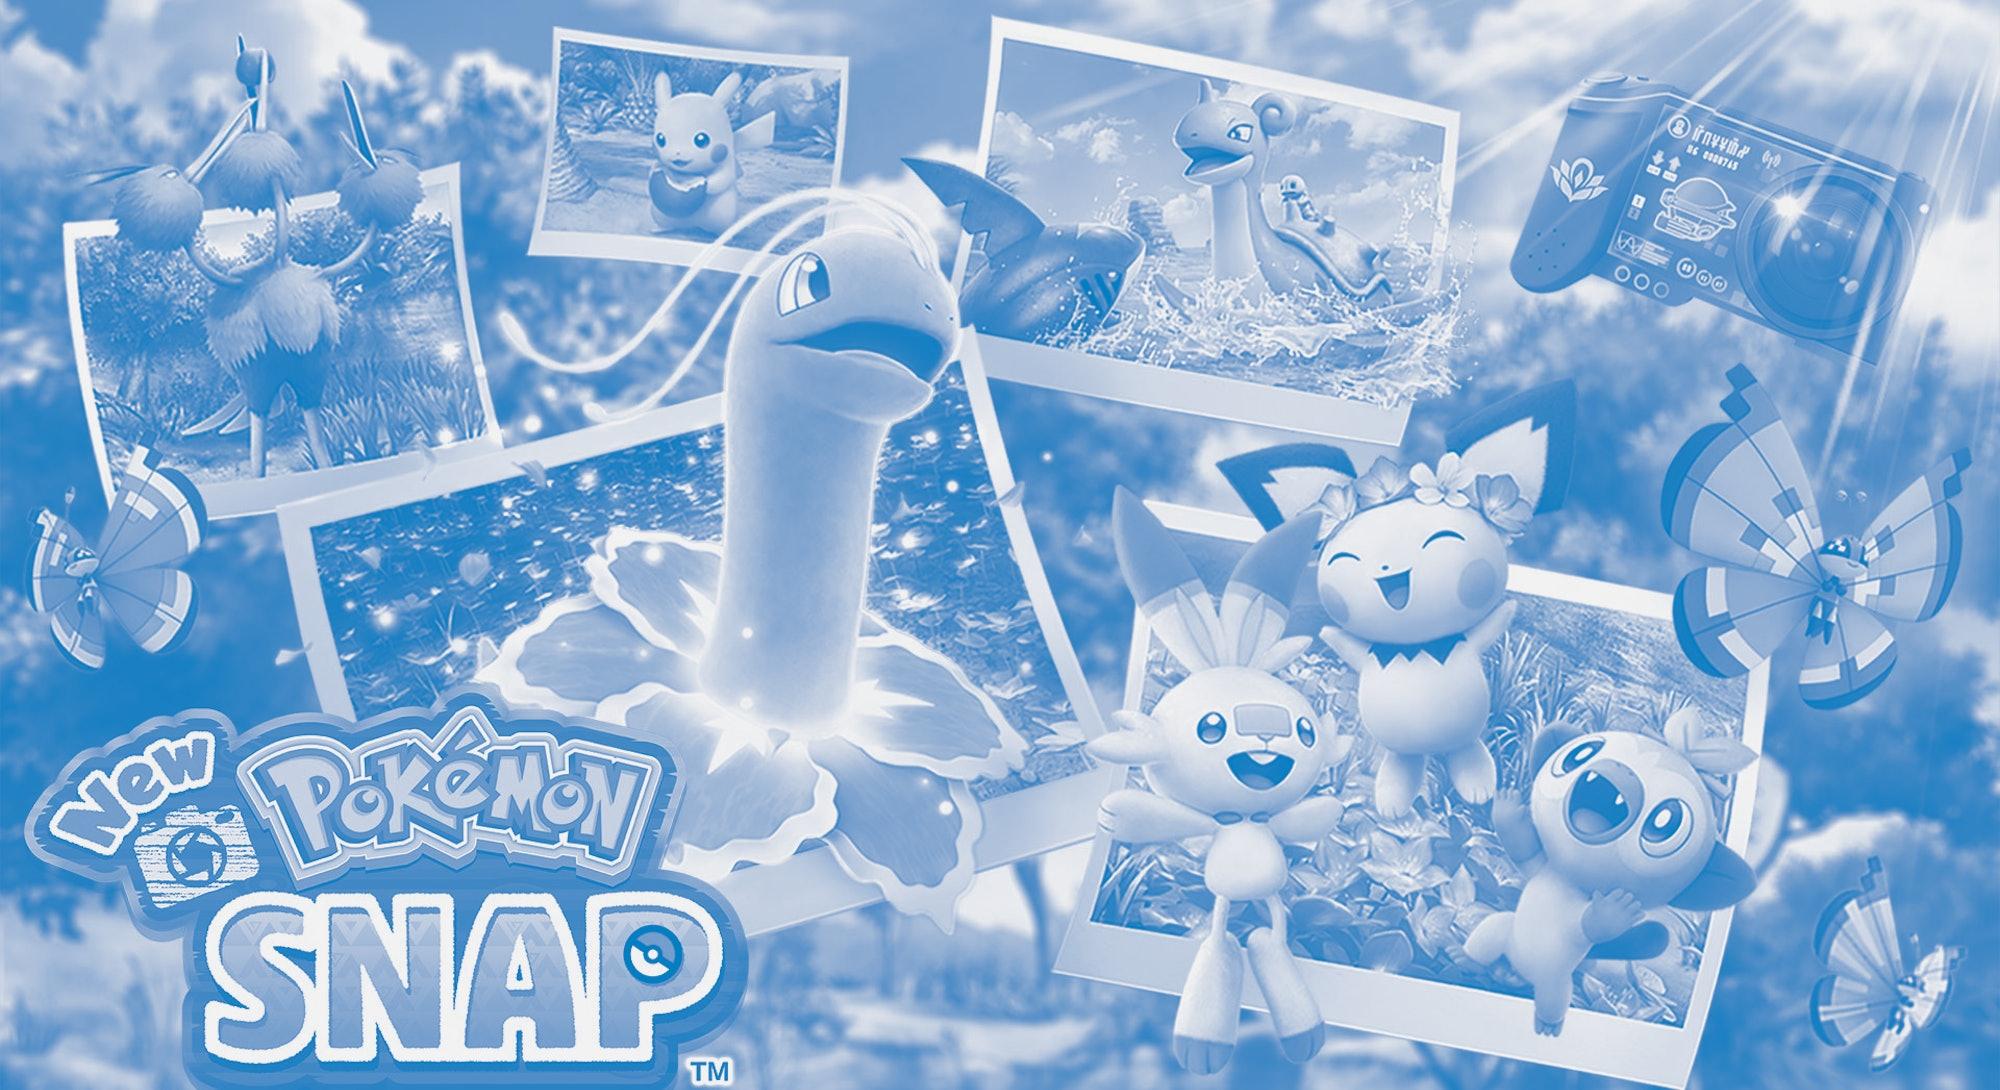 Pokemon snap cover.  Video games. Games. Nintendo. Pokemon Snap. Gaming.